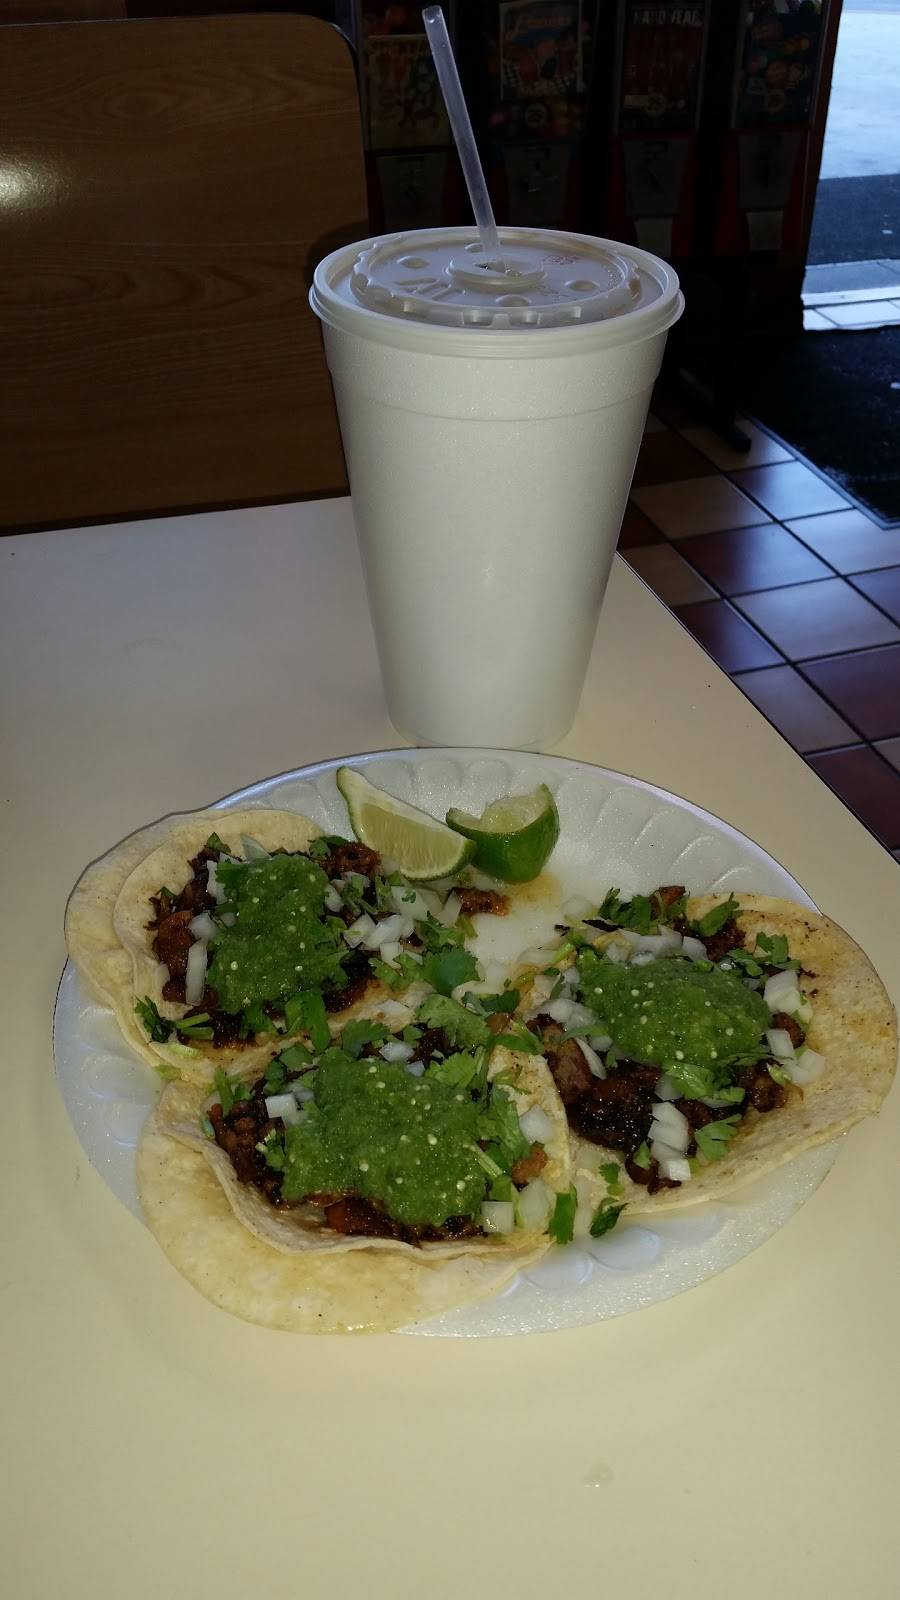 Taqueria Los Altos | restaurant | 1612 W Katella Ave, Anaheim, CA 92802, USA | 7146382022 OR +1 714-638-2022